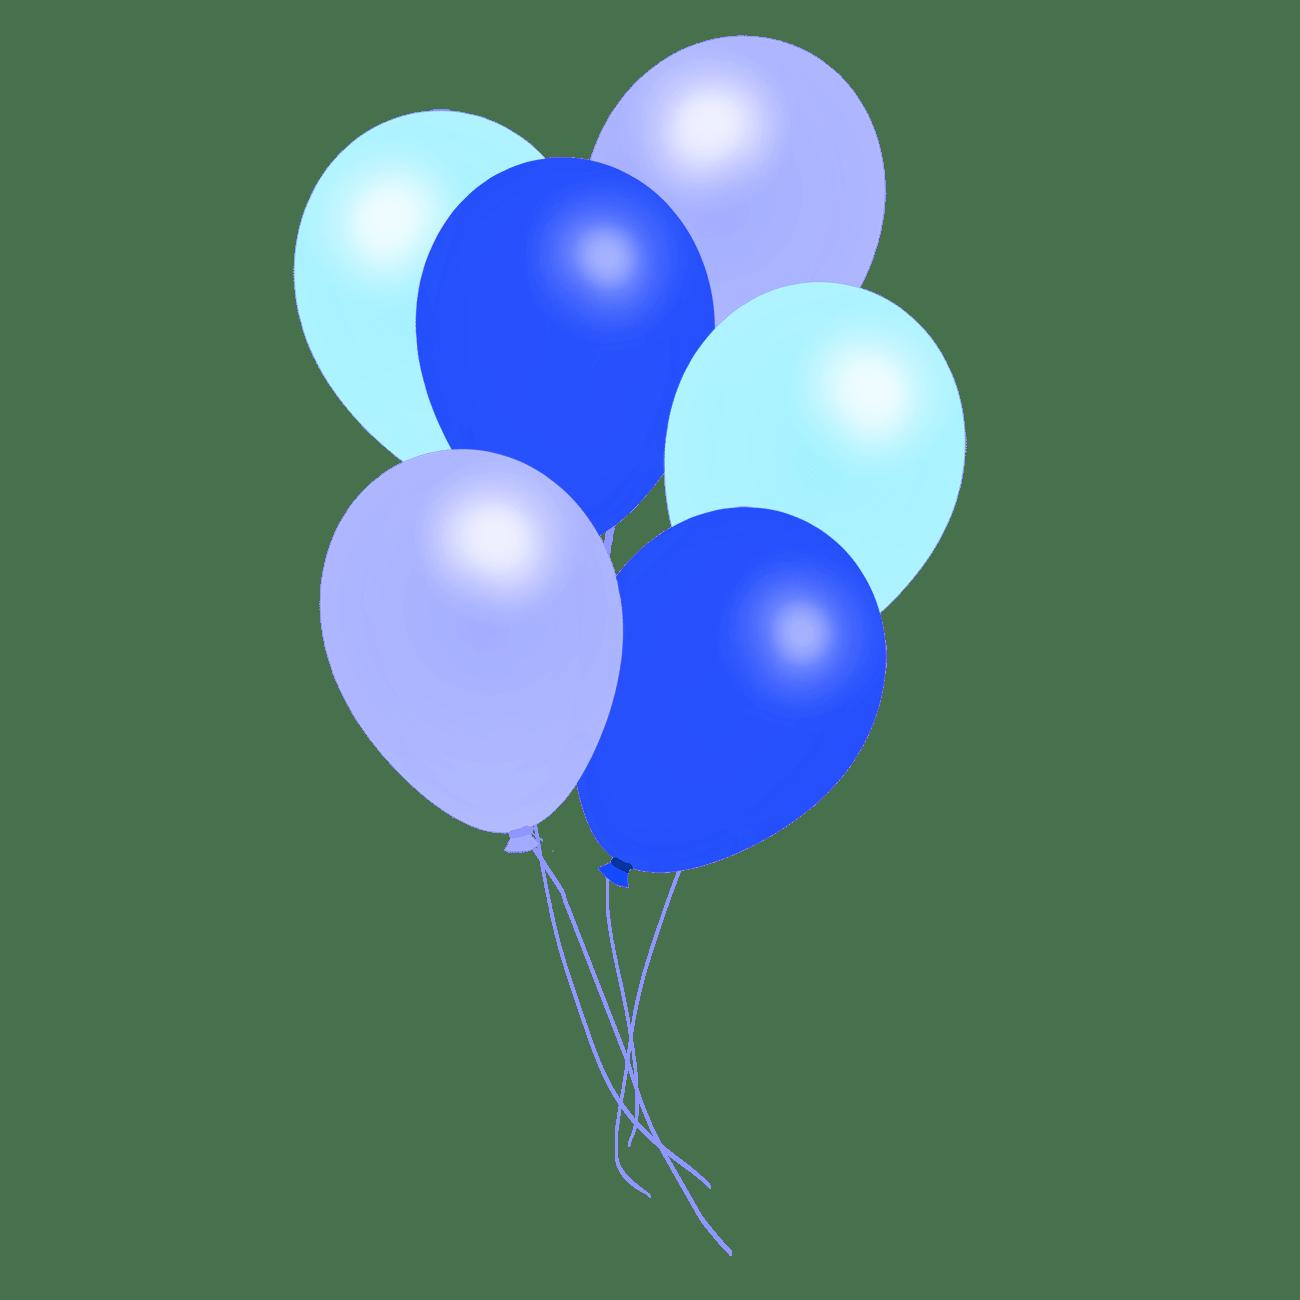 Balloon Transparent Gallery